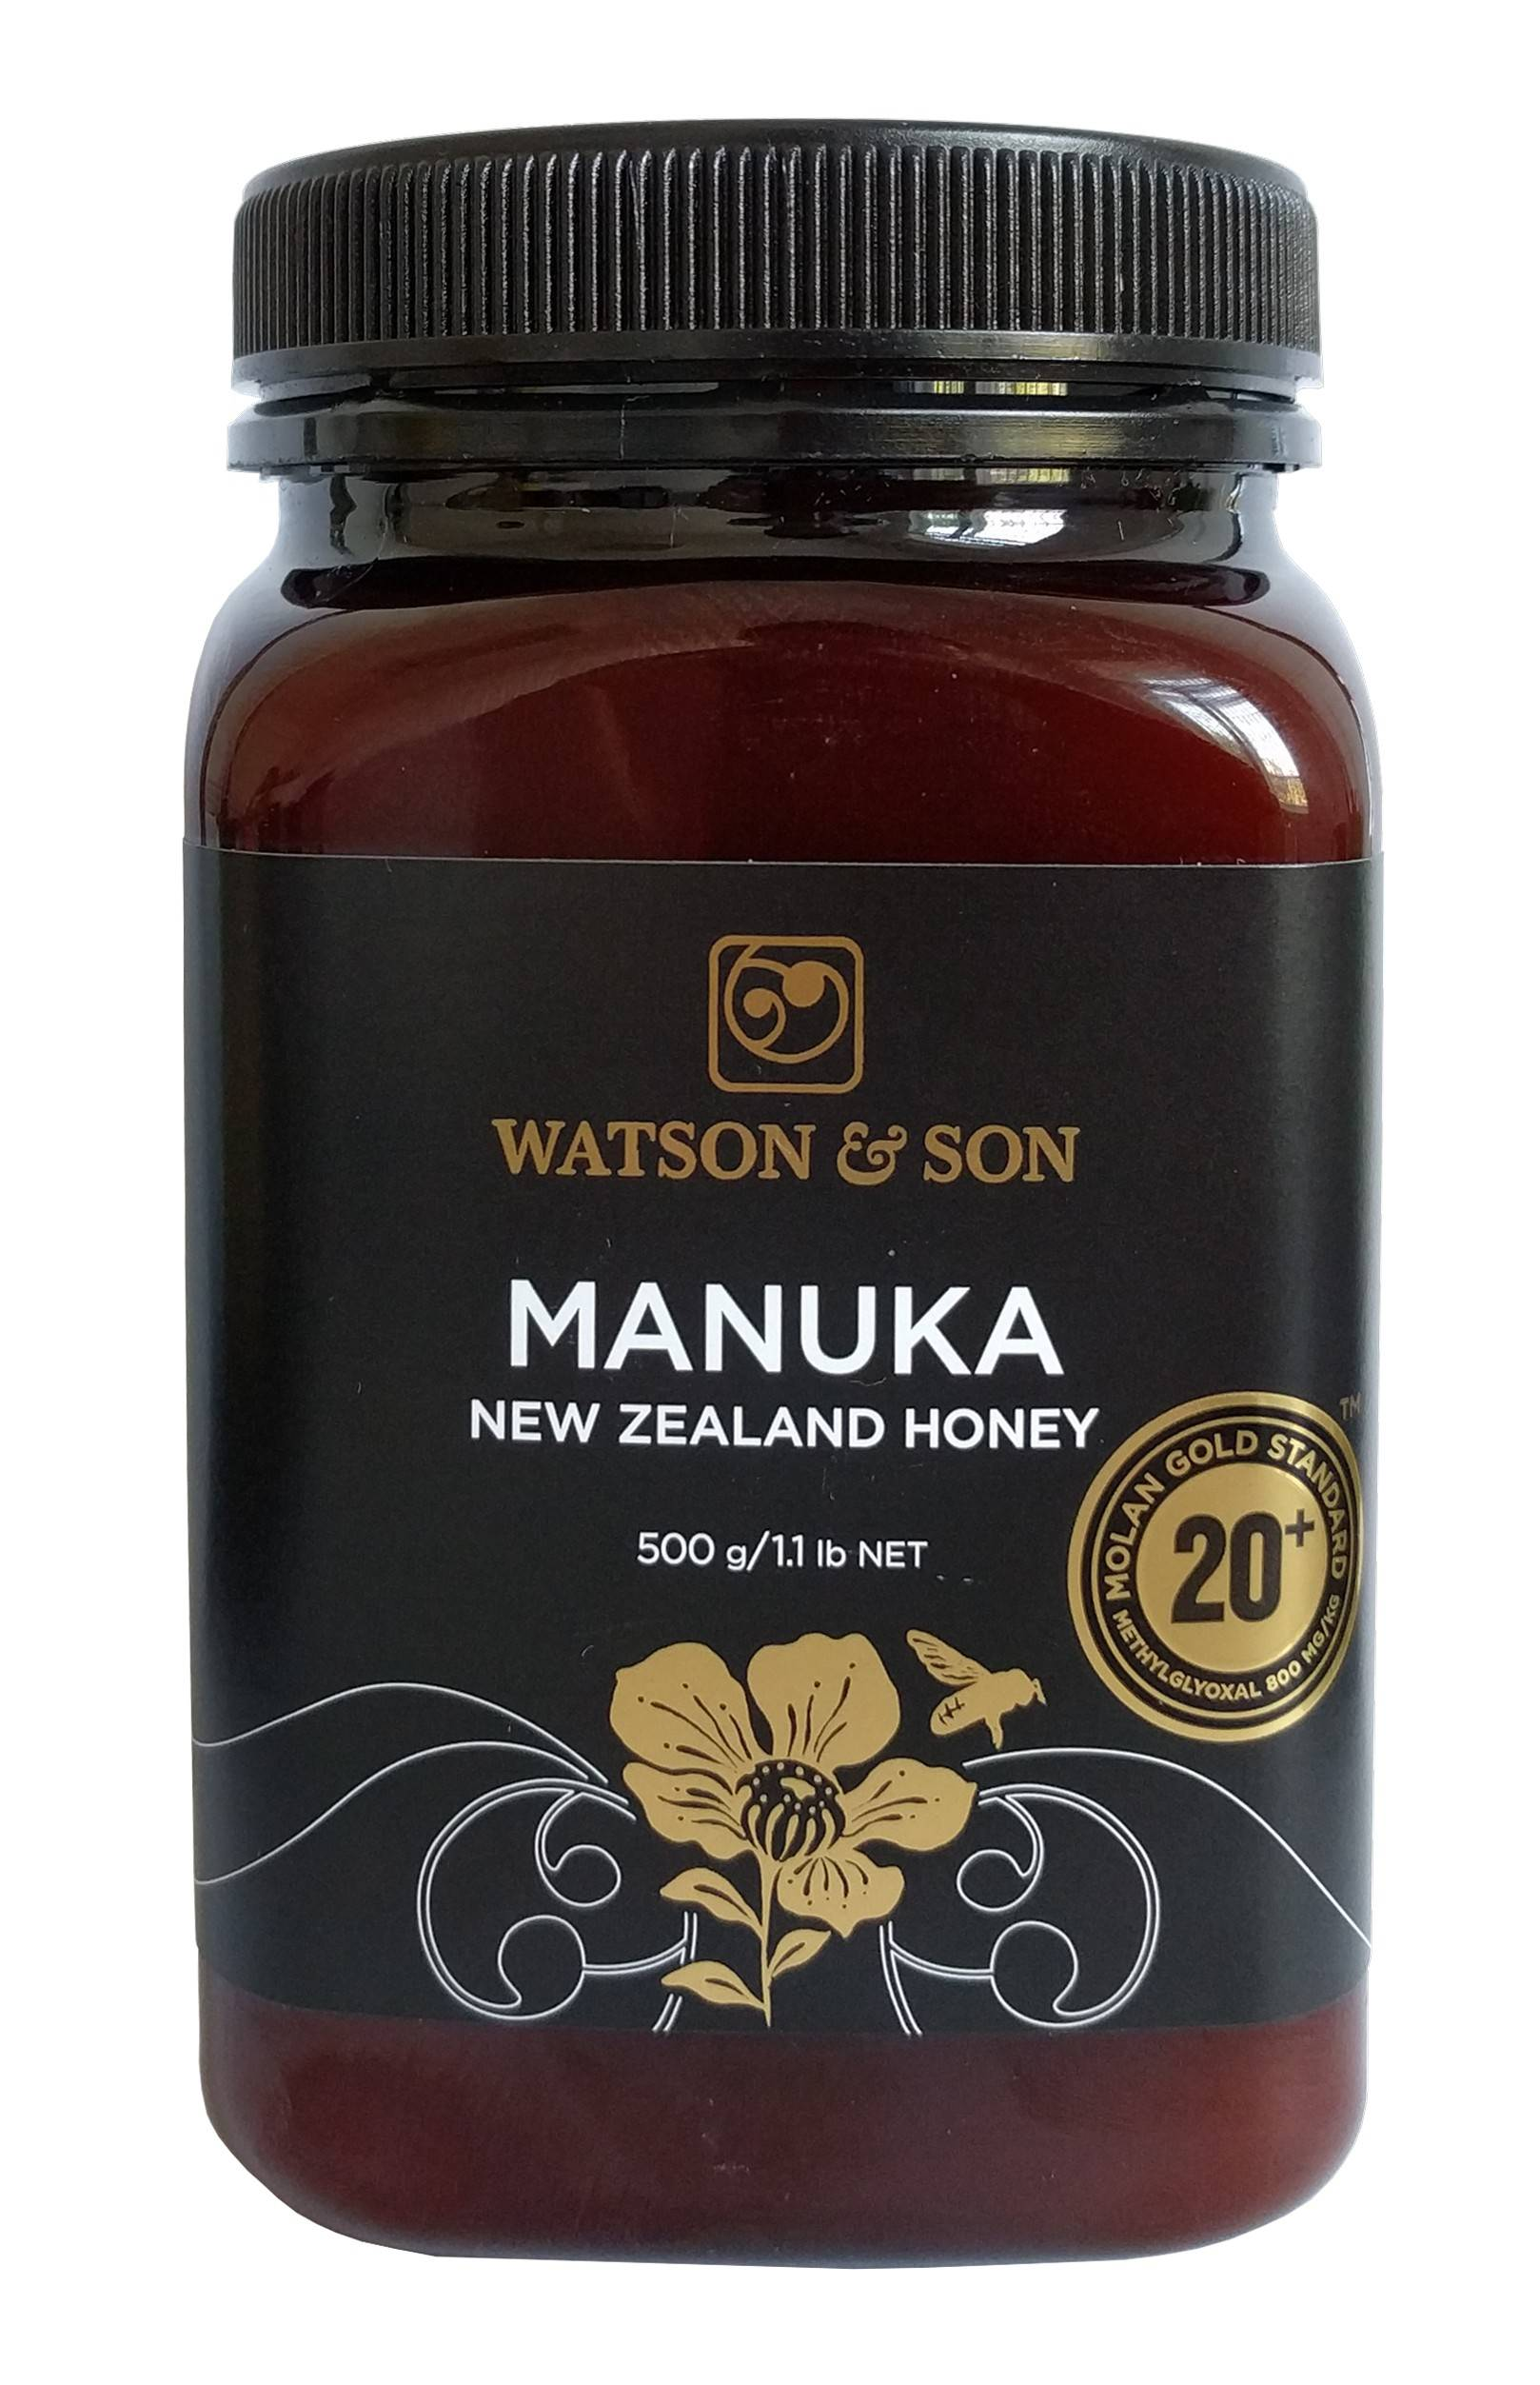 miere de manuka 800+mgo (20+) 500gr watson & son